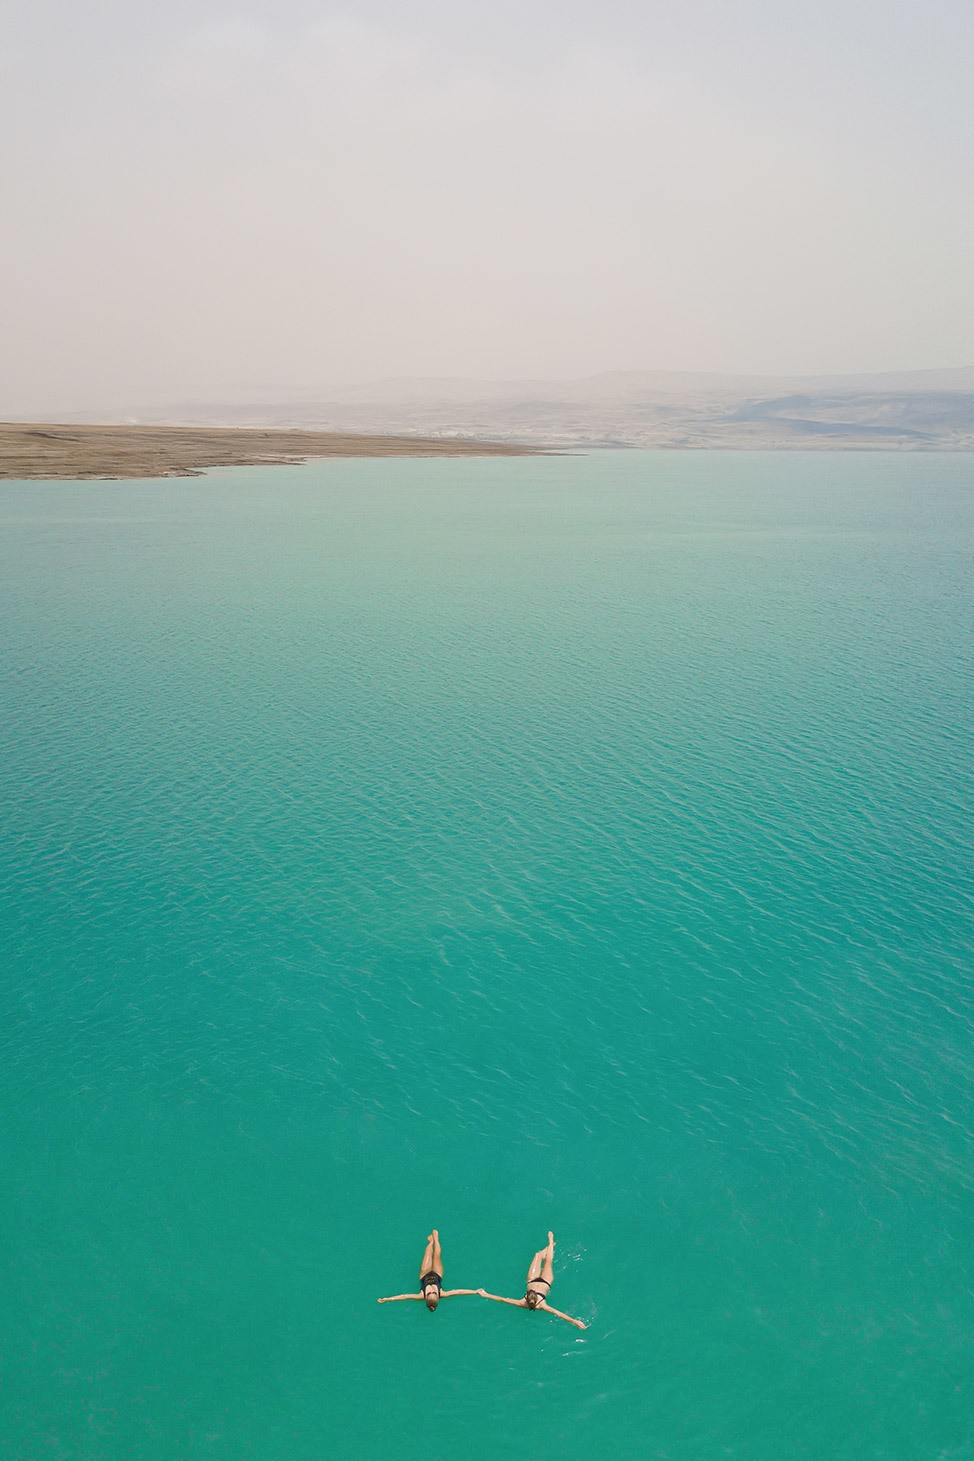 Why I Traveled to Israel